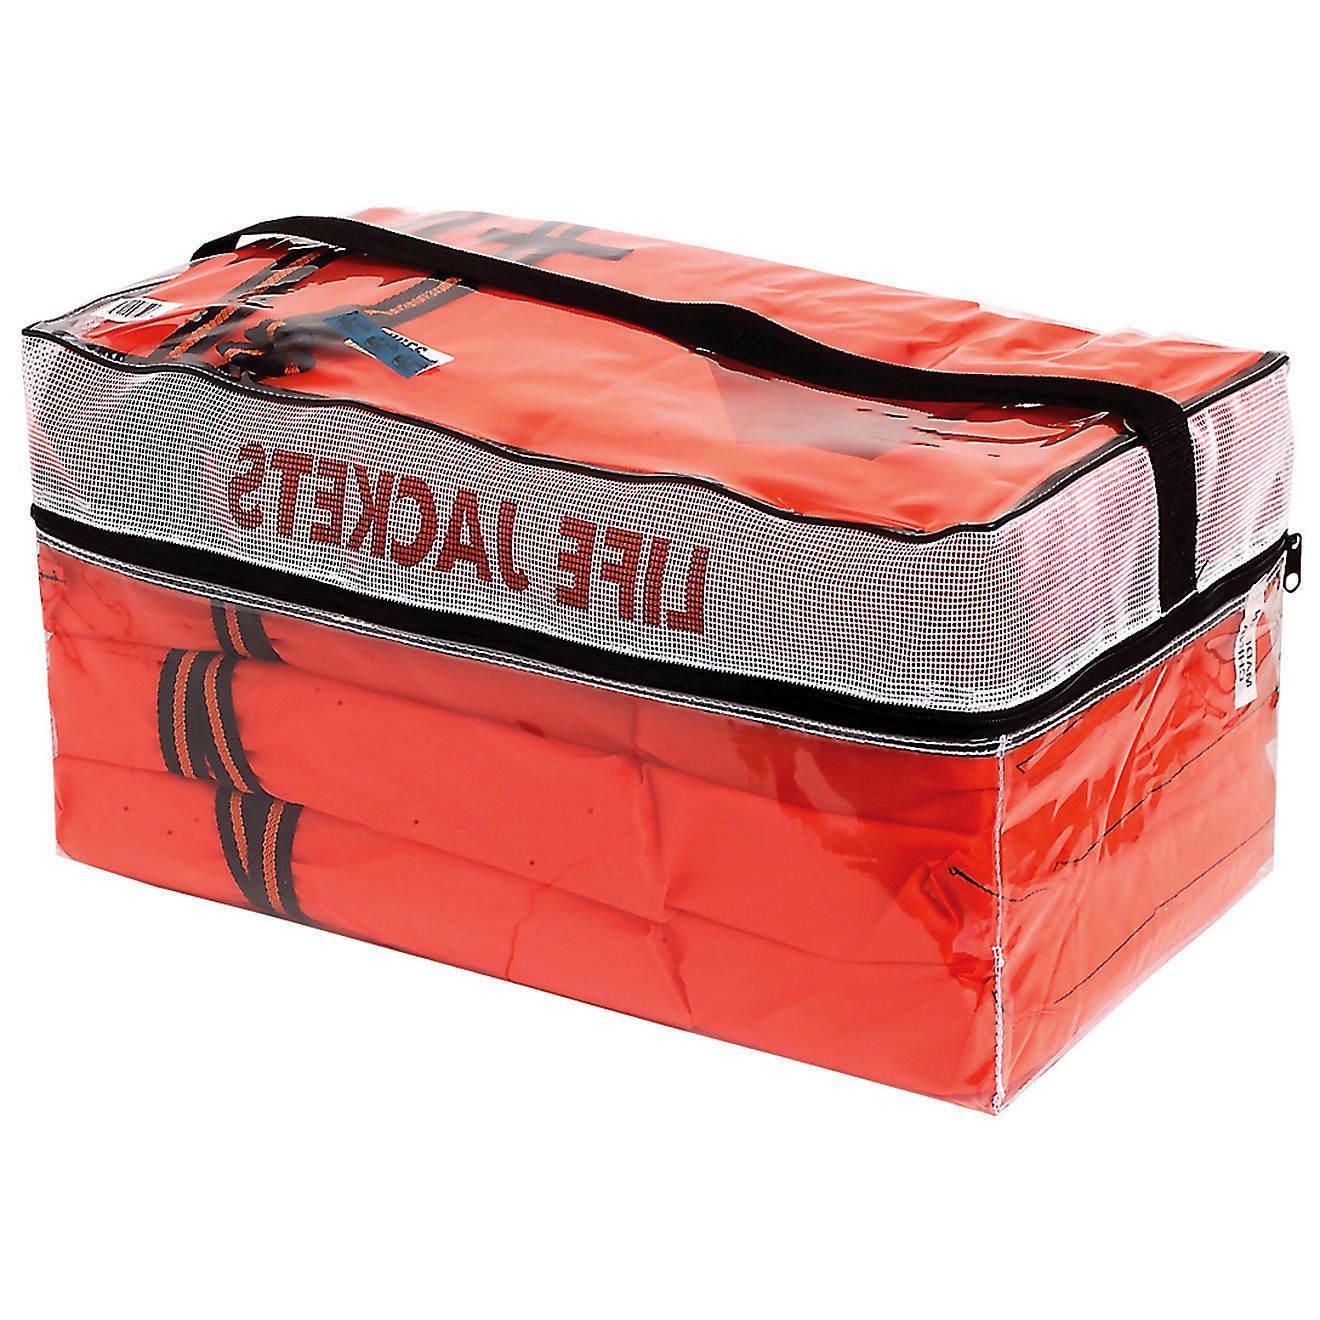 life jackets vest preserver 4 pack type